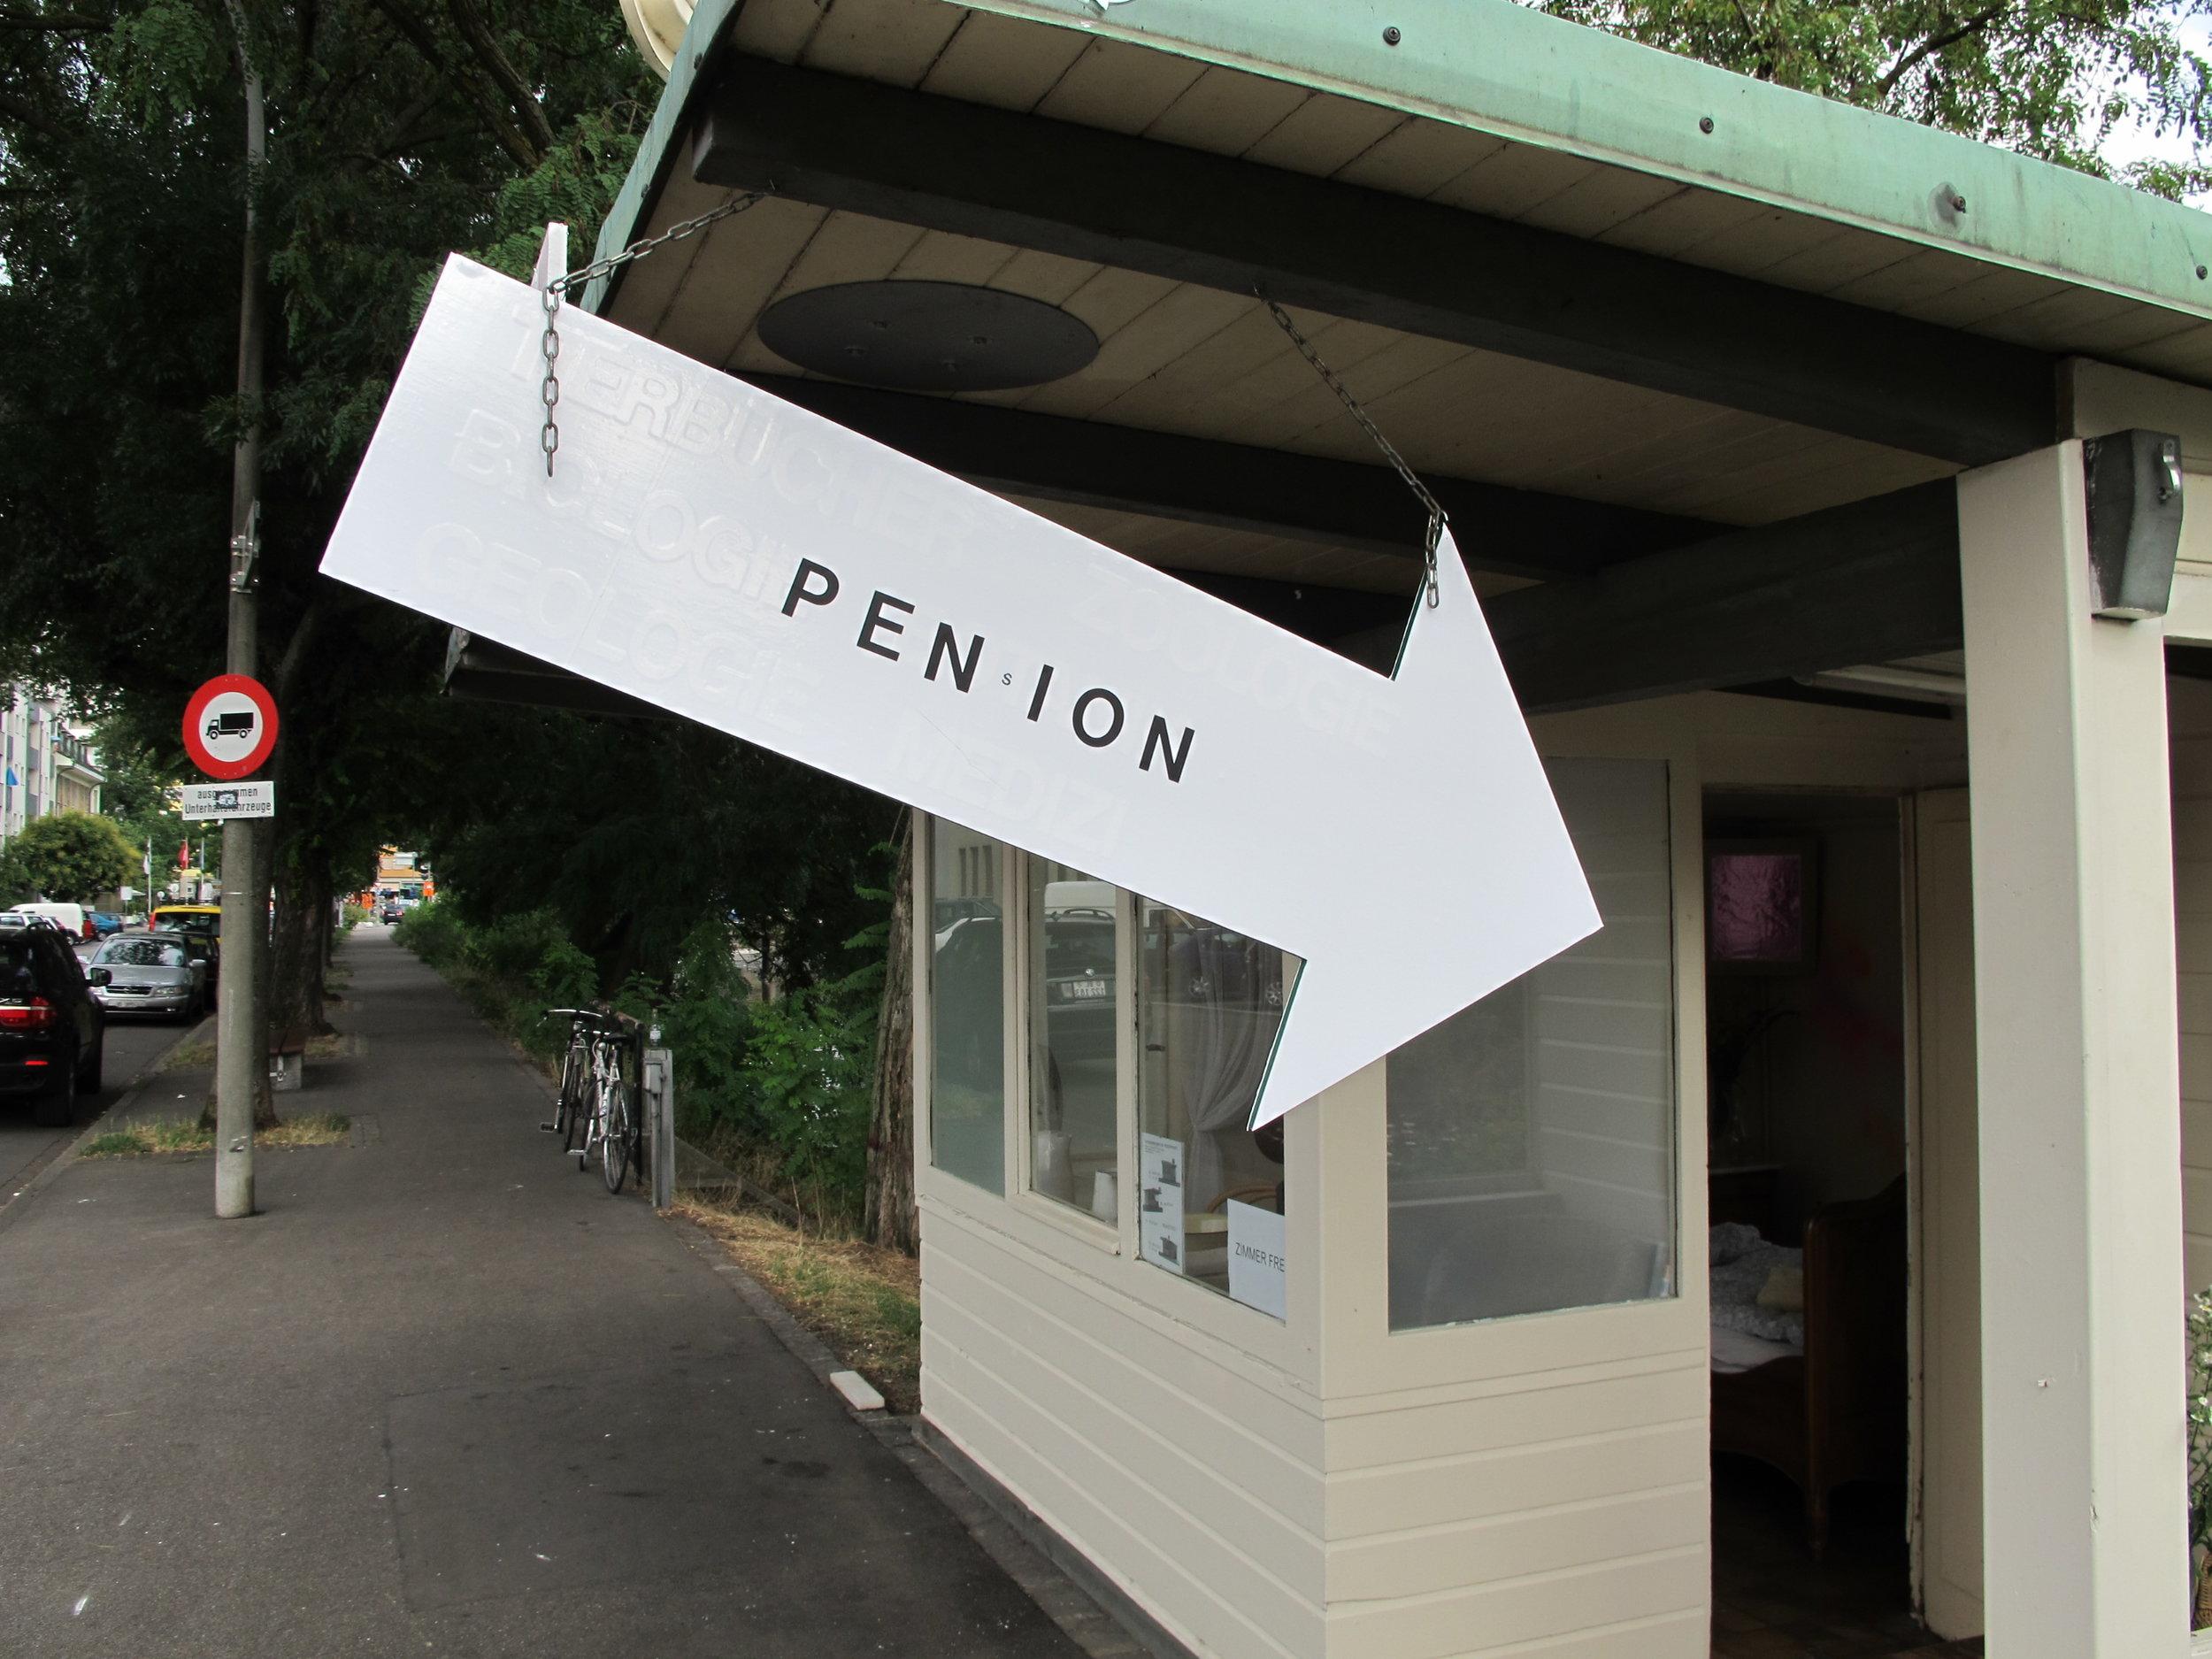 Angies-Pension-13.jpg